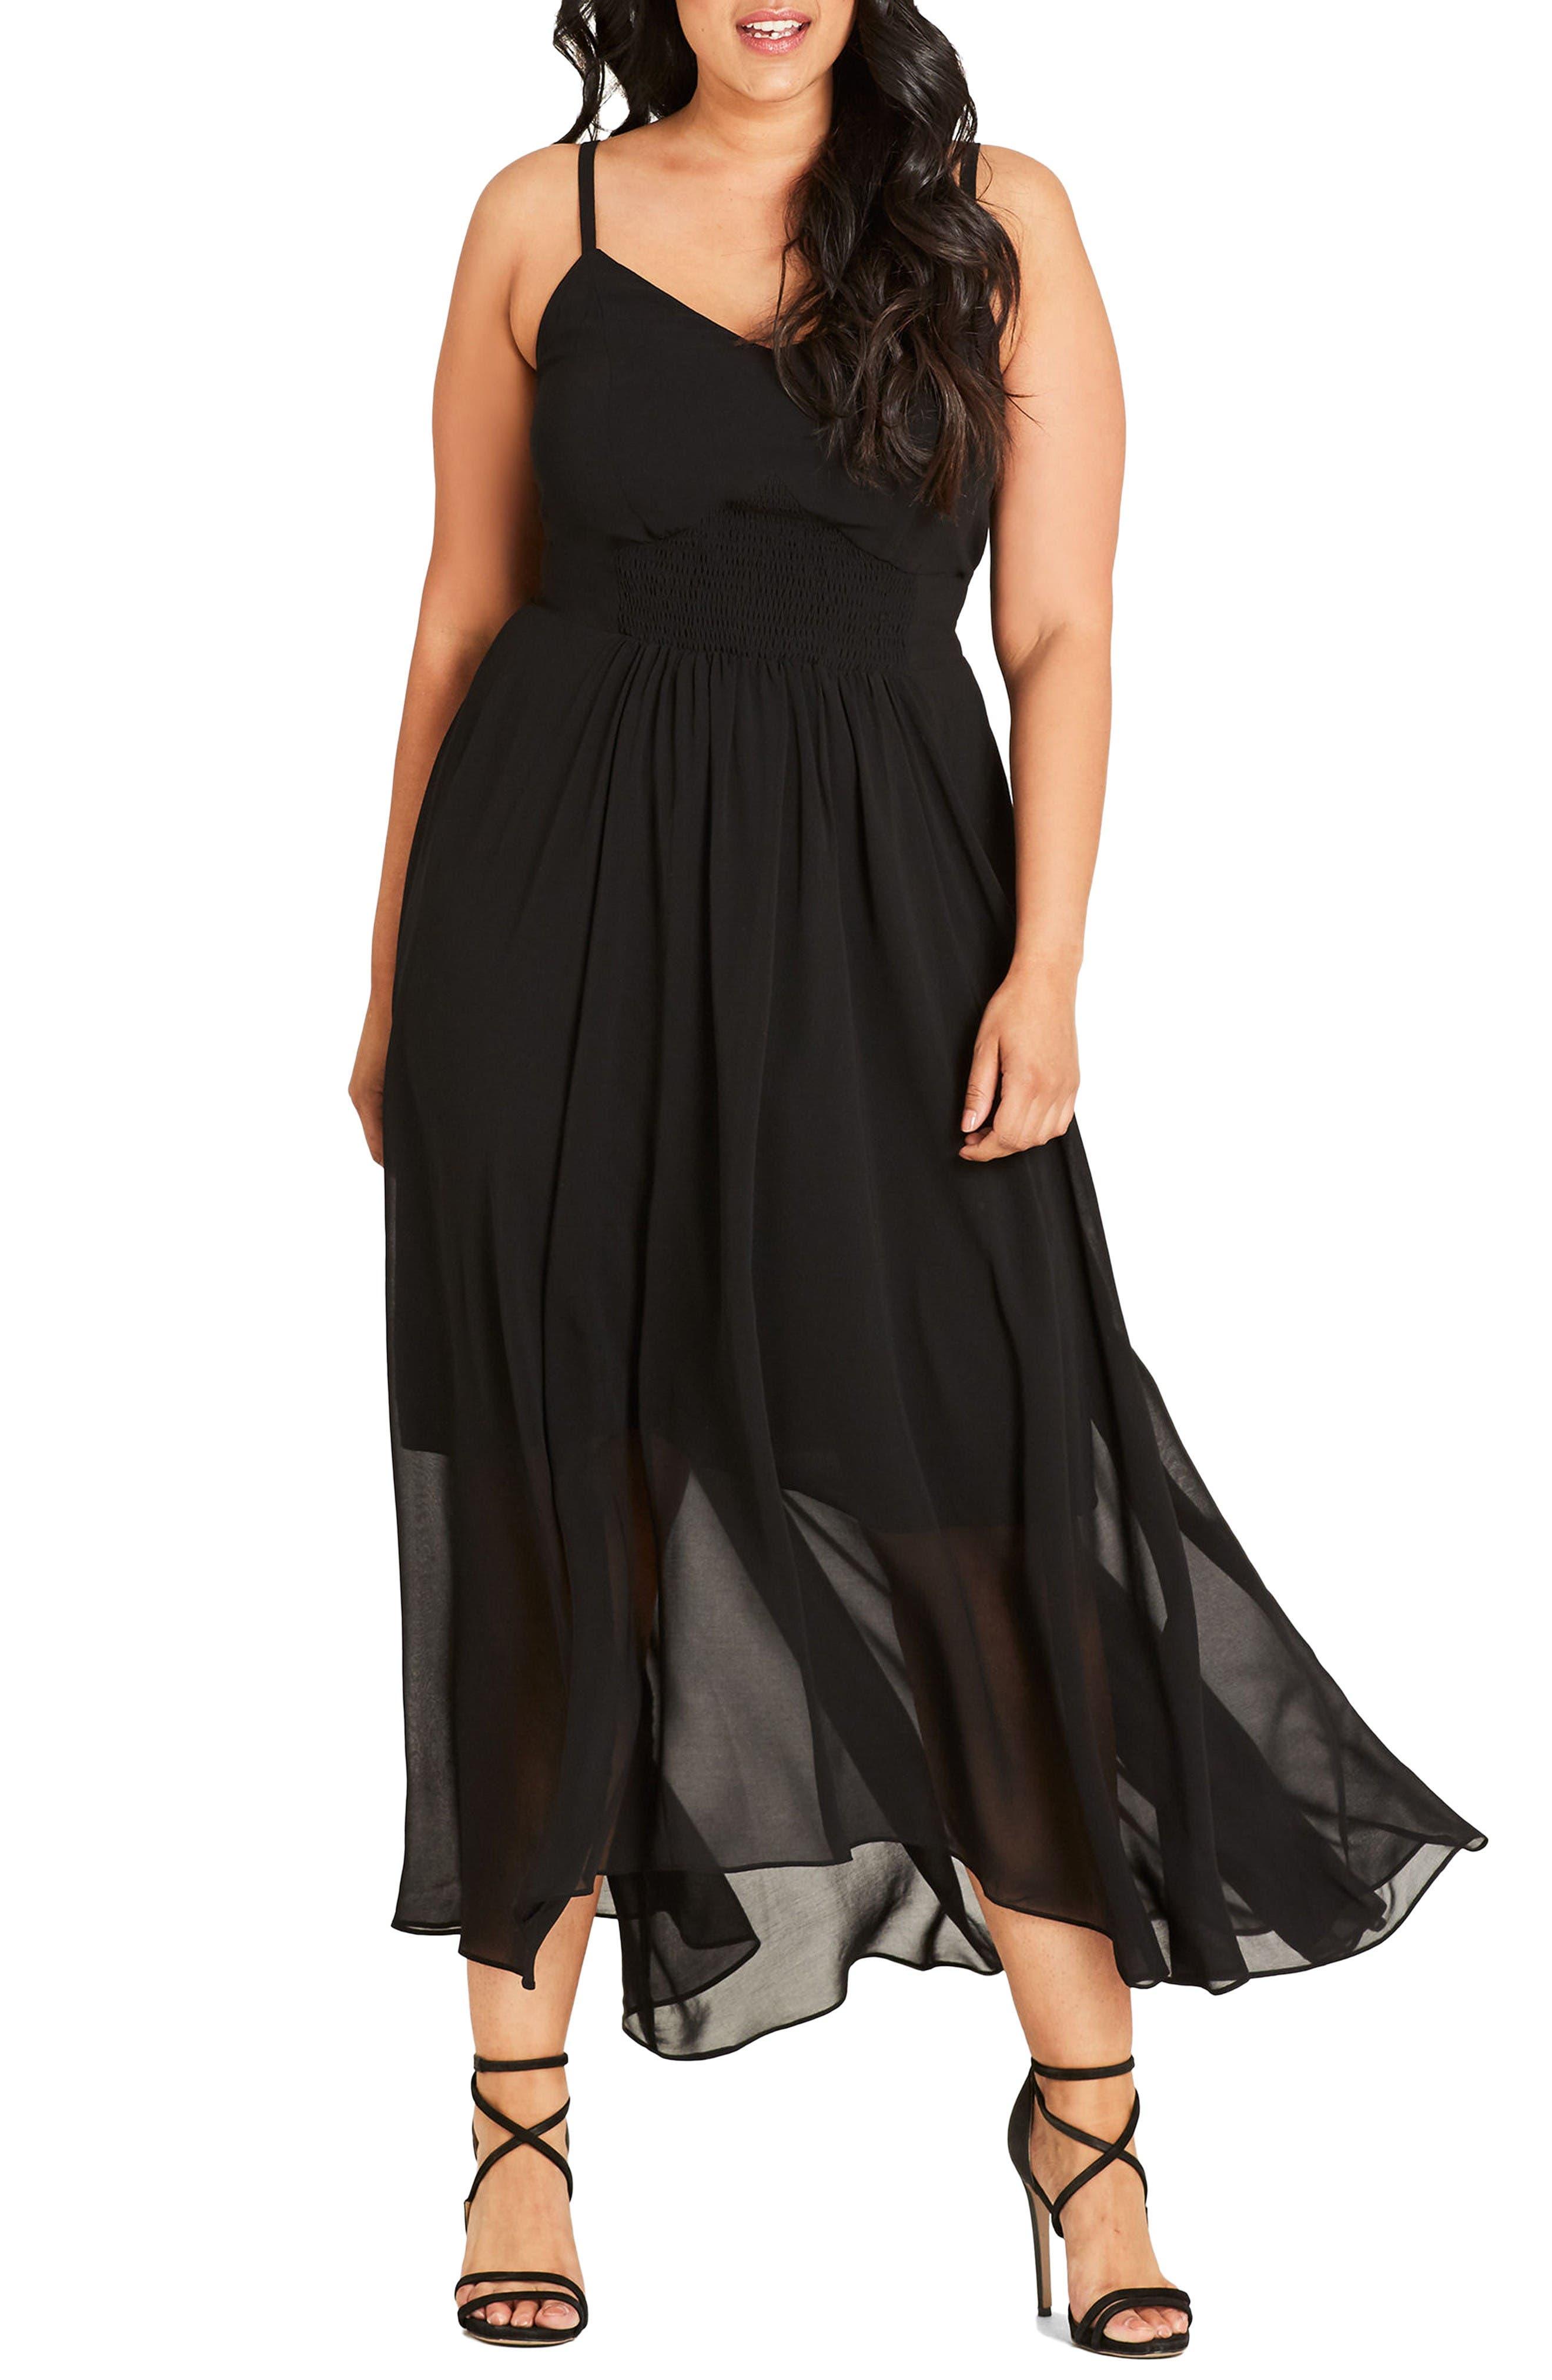 Alternate Image 1 Selected - City Chic Smocked Waist Maxi Dress (Plus Size)